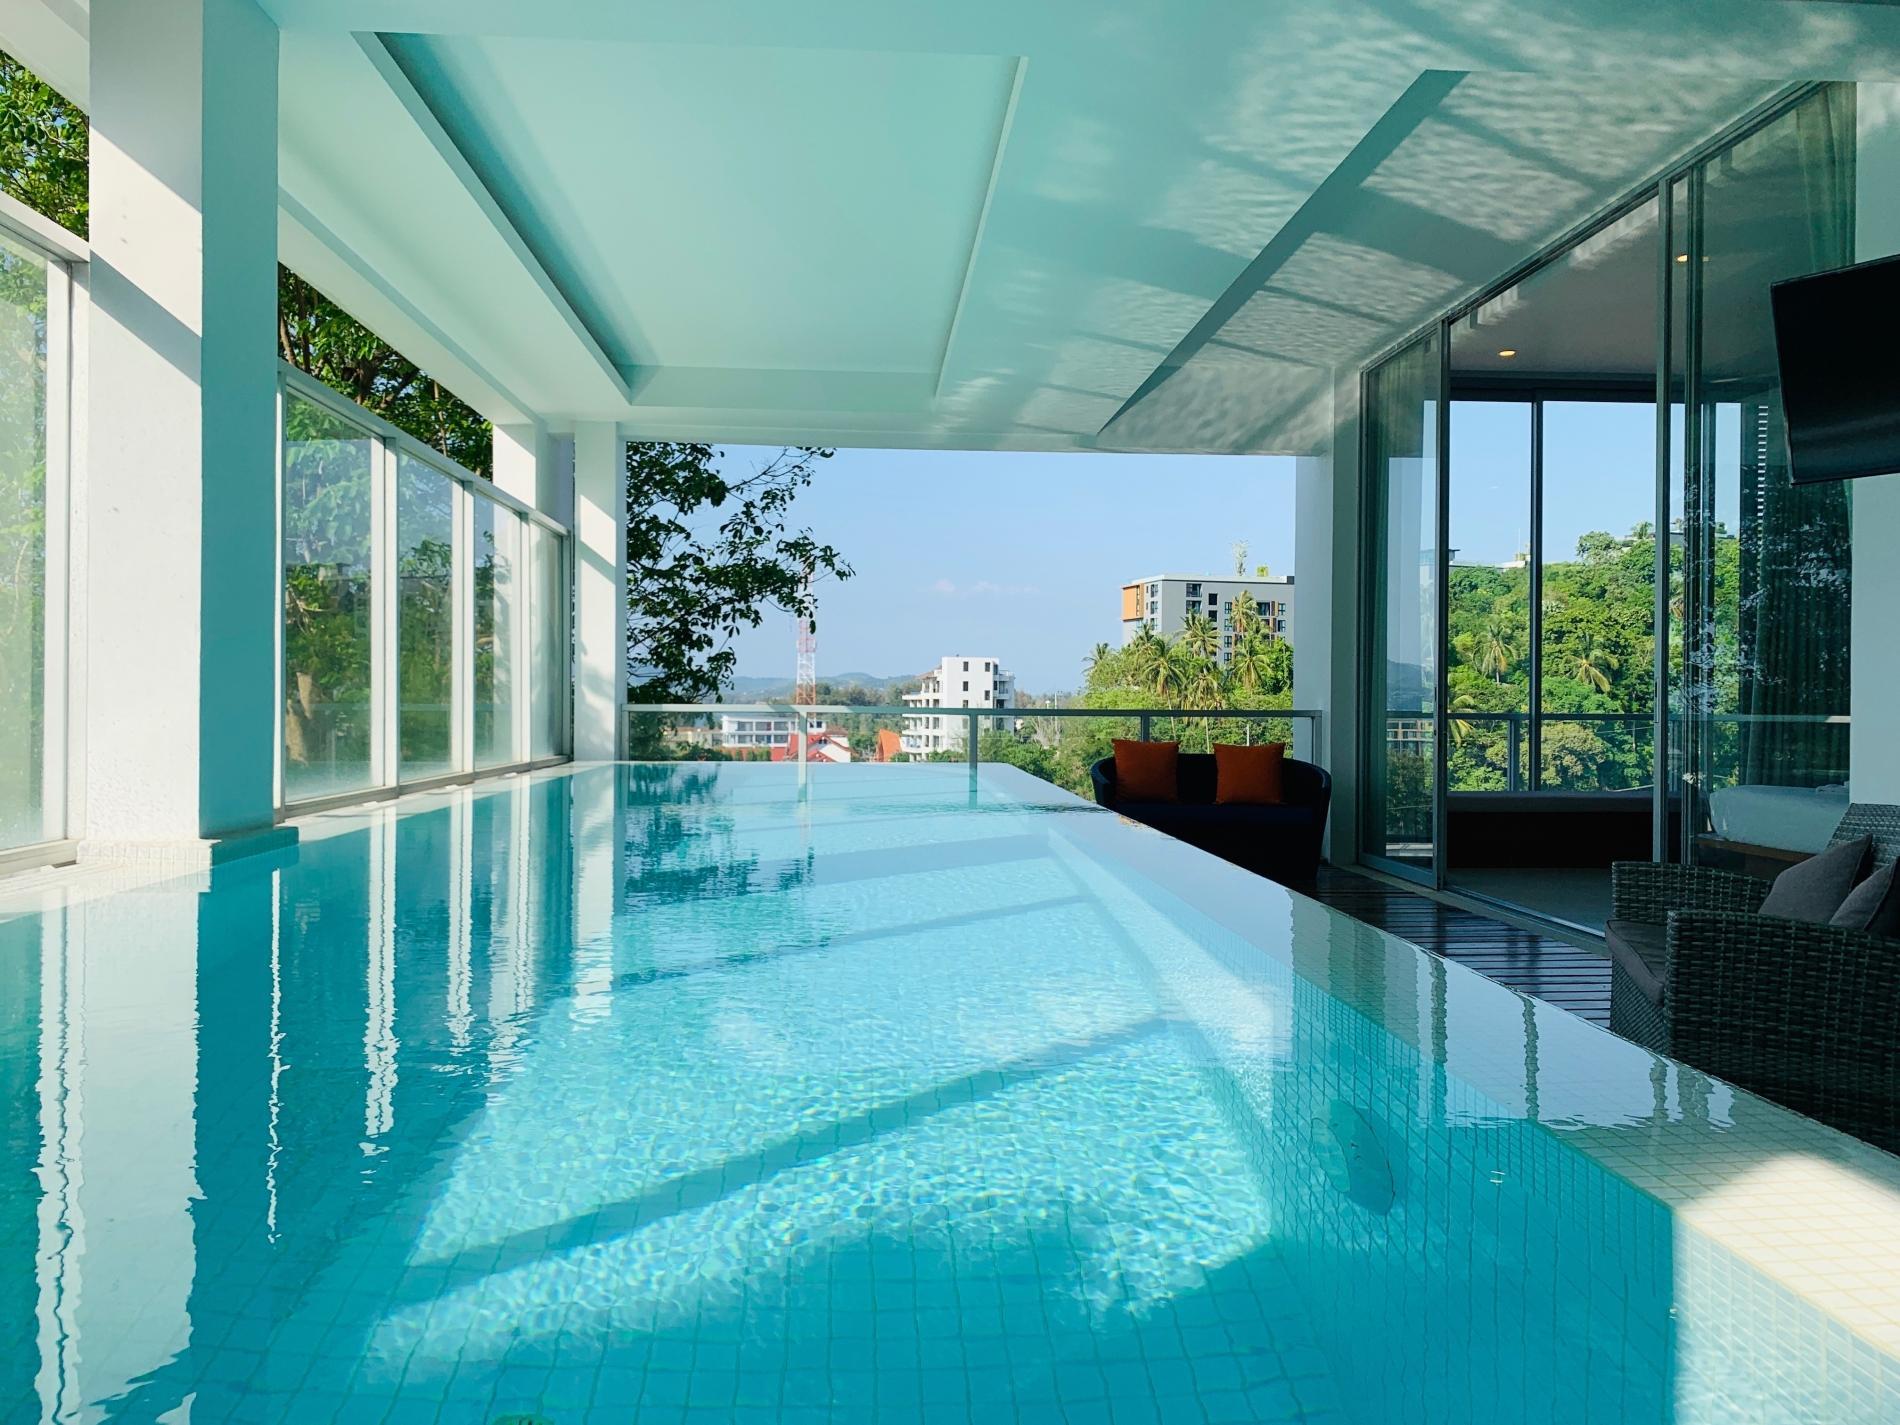 Apartment The Quarter 301 - Luxury Surin 3 bedroom apartment private pool photo 26108702